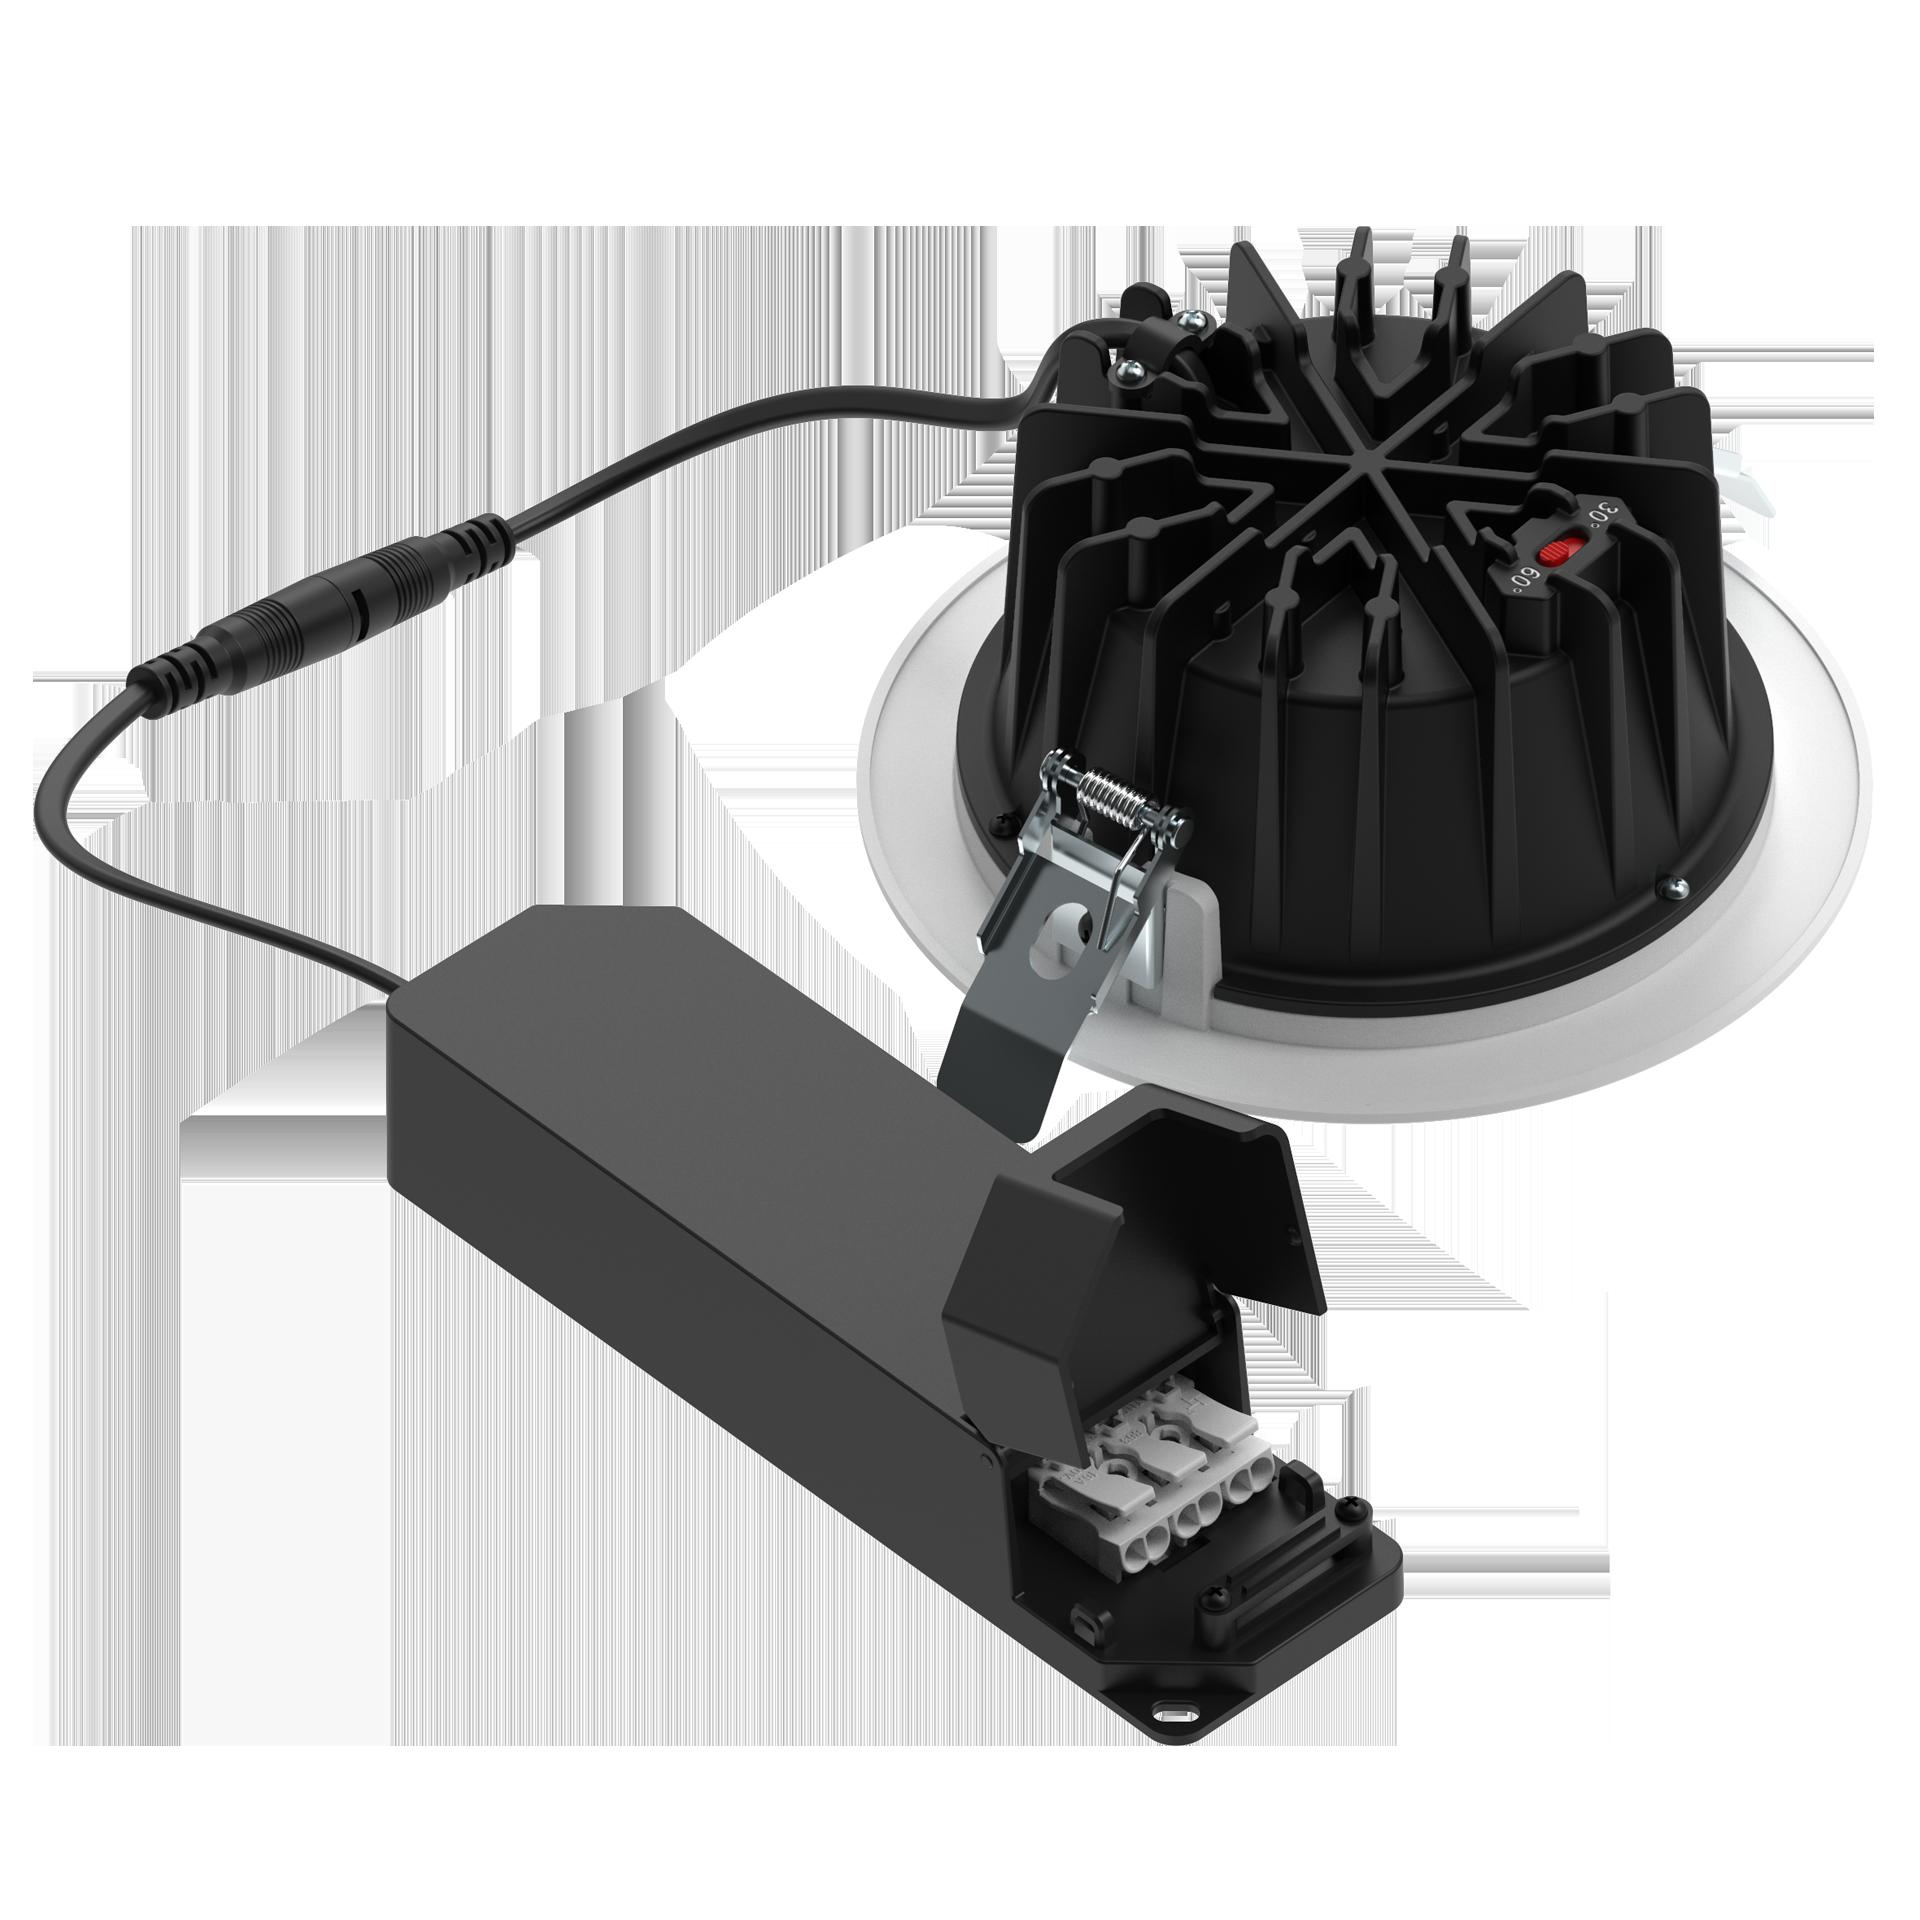 OEM/ODM Manufacturer 8 Inch Can Light Led Retrofit 20watt - 2 Beam Angles SWITCHABLE  8W/10W/13W/15W/20W/25W/30W/35W Commercial downlights – Radiant Lighting